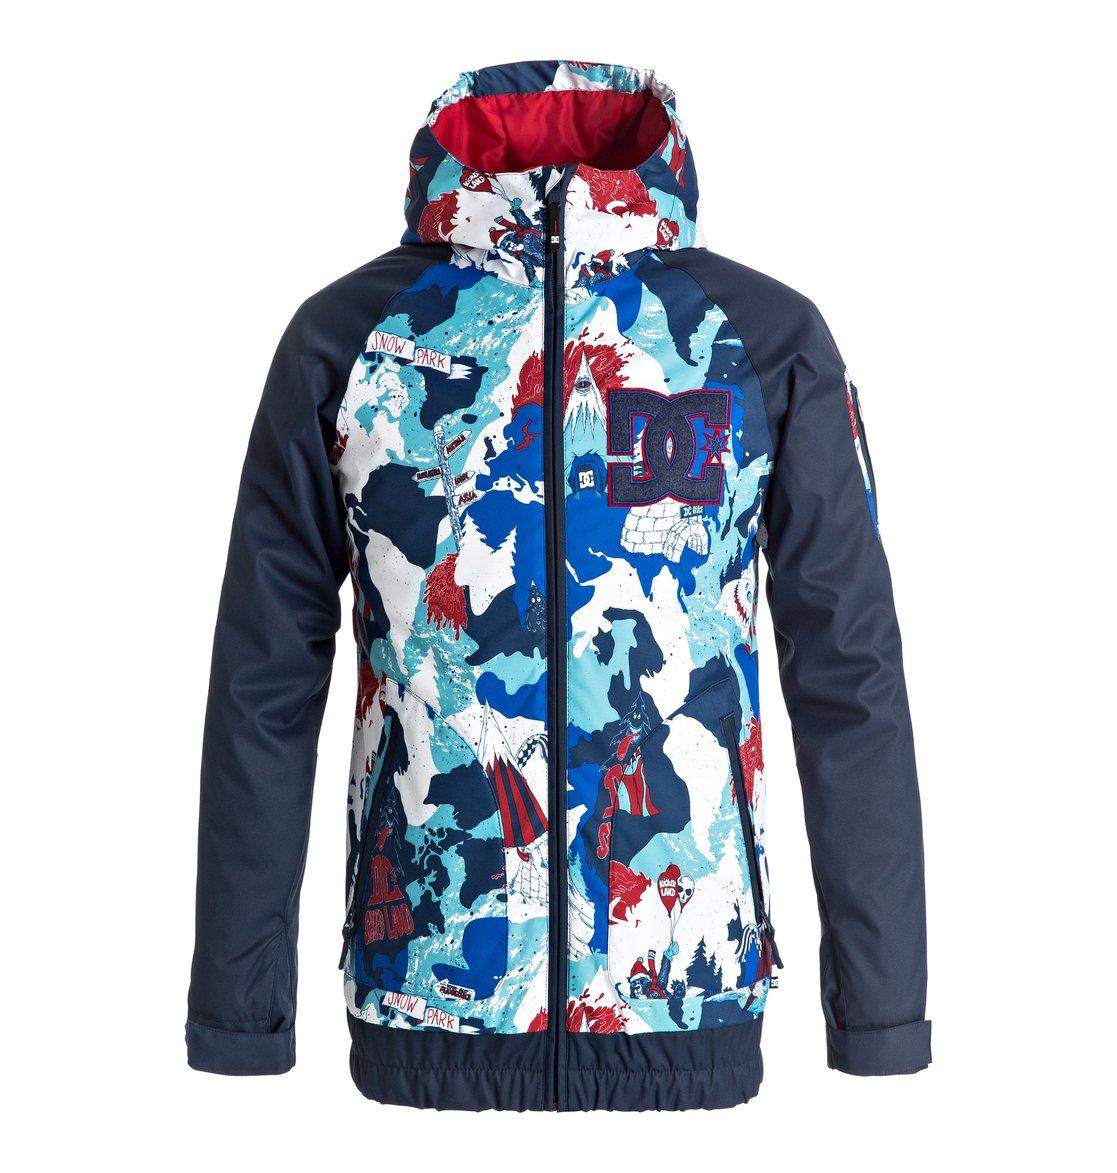 6d8a17995 Boy s 8-16 Troop Snow Jacket EDBTJ03019